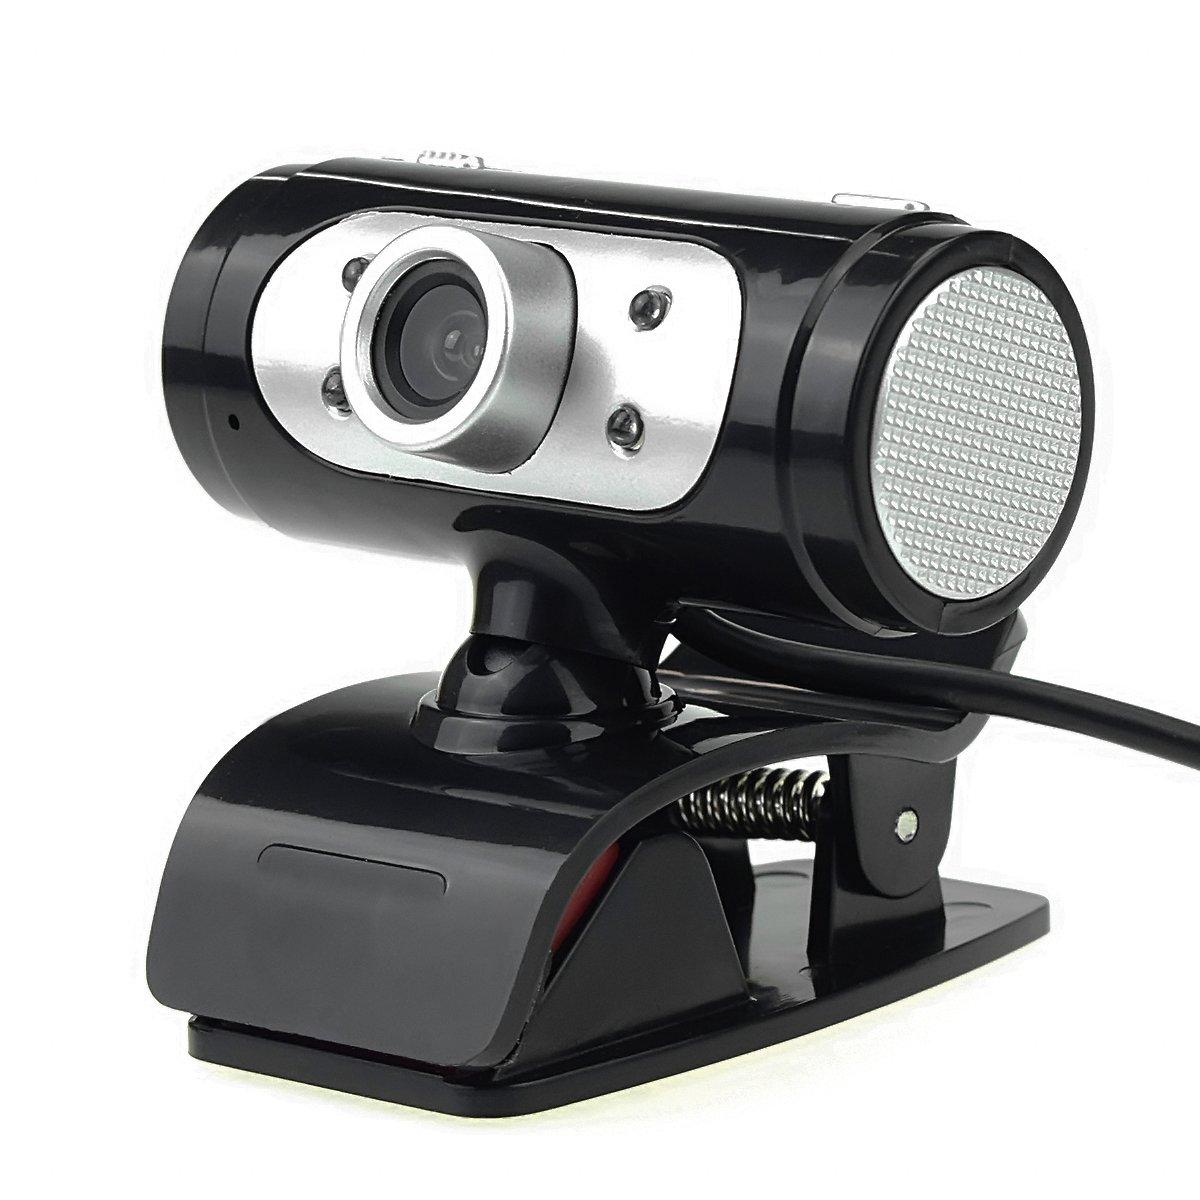 USB HD Webcam 1080P Video Web Camera with Built-in Sound Digital Microphone LED Lights for Desktop Laptop Shenzhen YoLuke Technology Co. Limited A7260